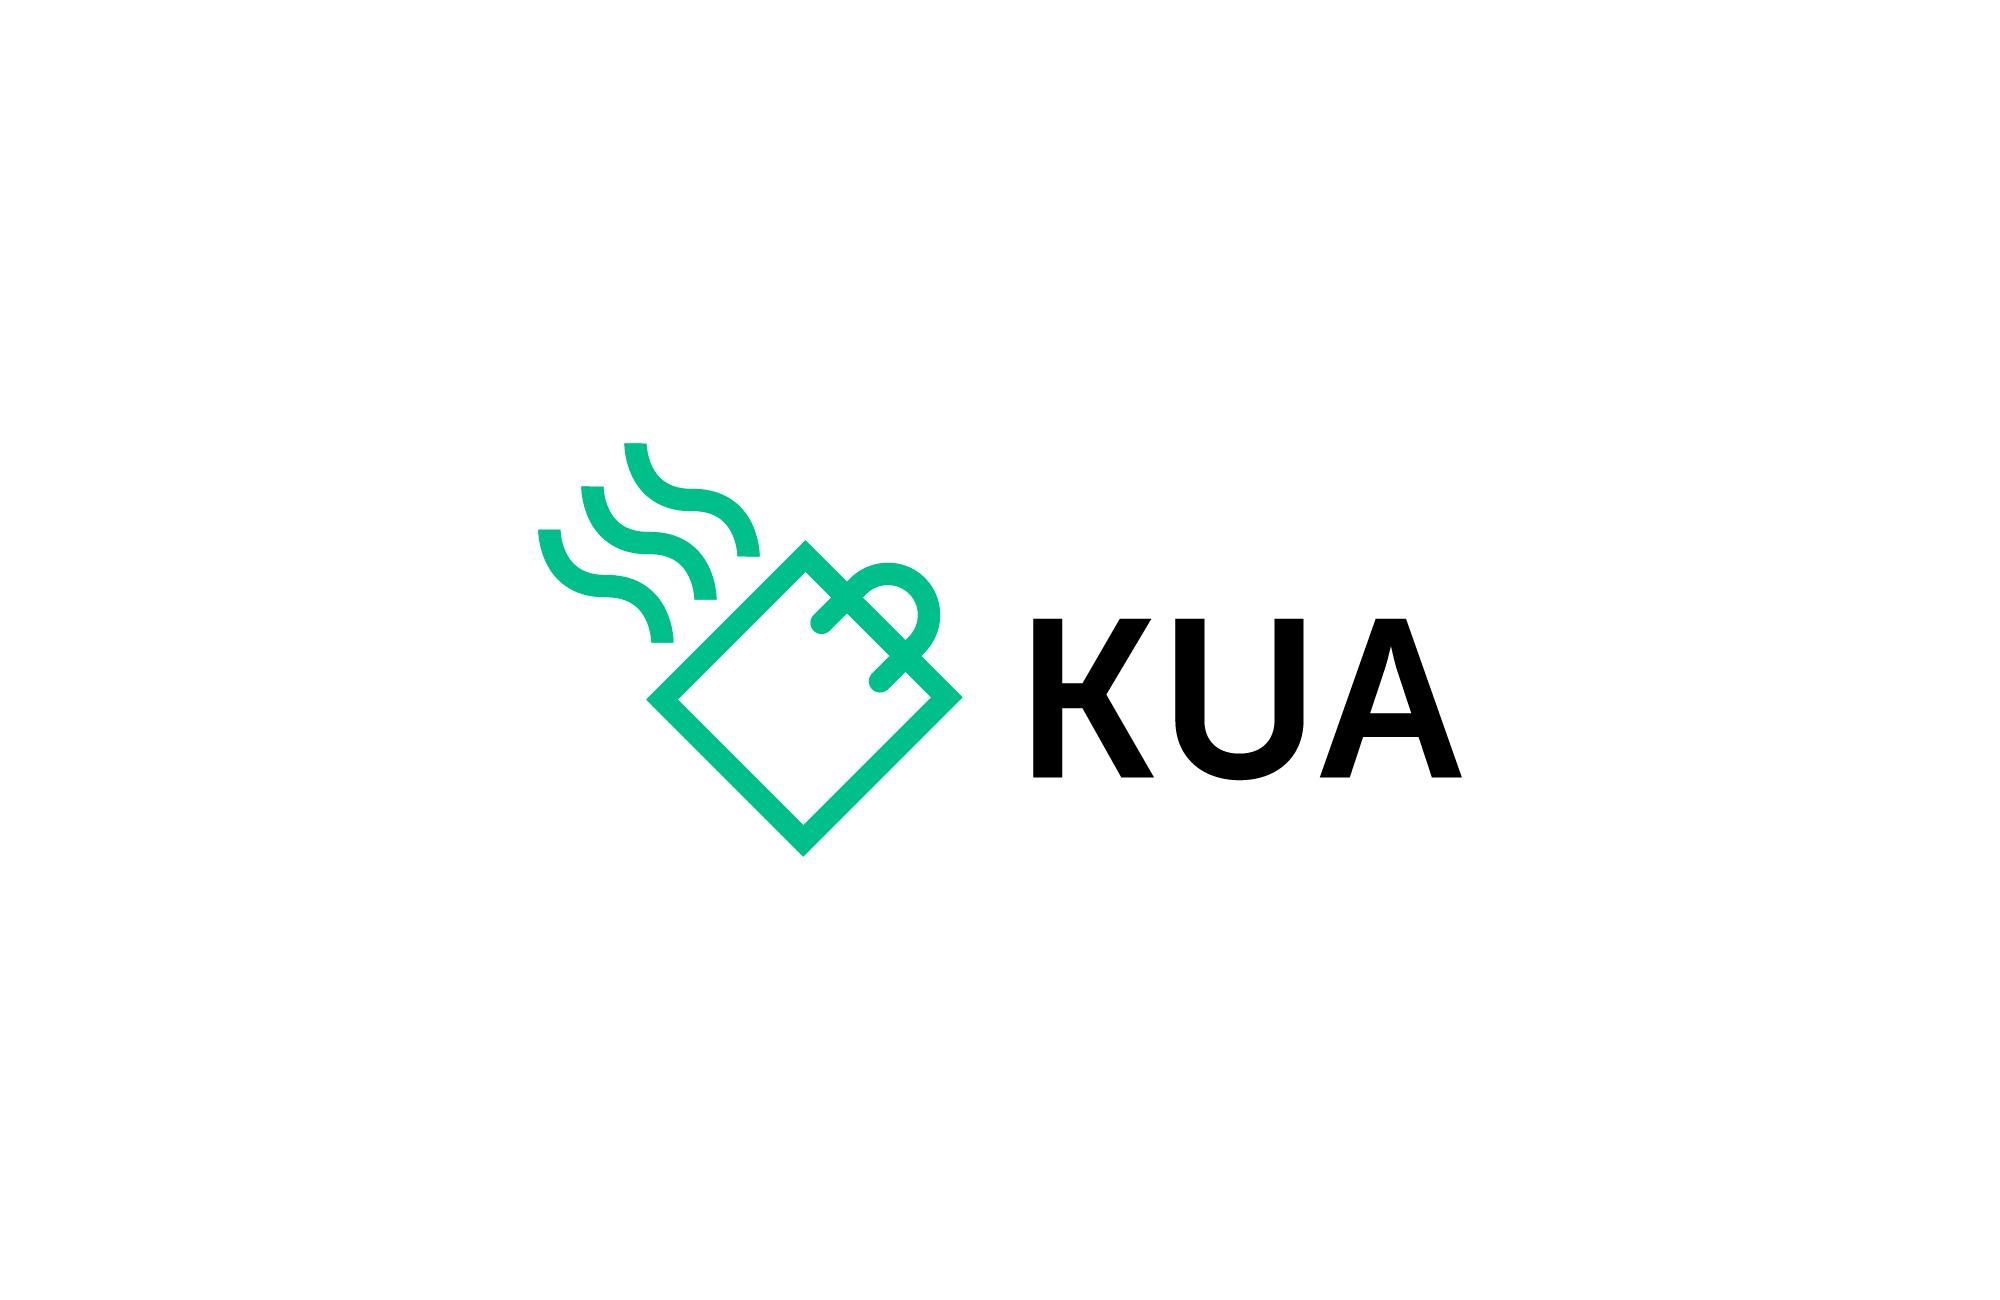 boom-agencia-marketing-digital-branding-kua-cafe-tienda-online-logo